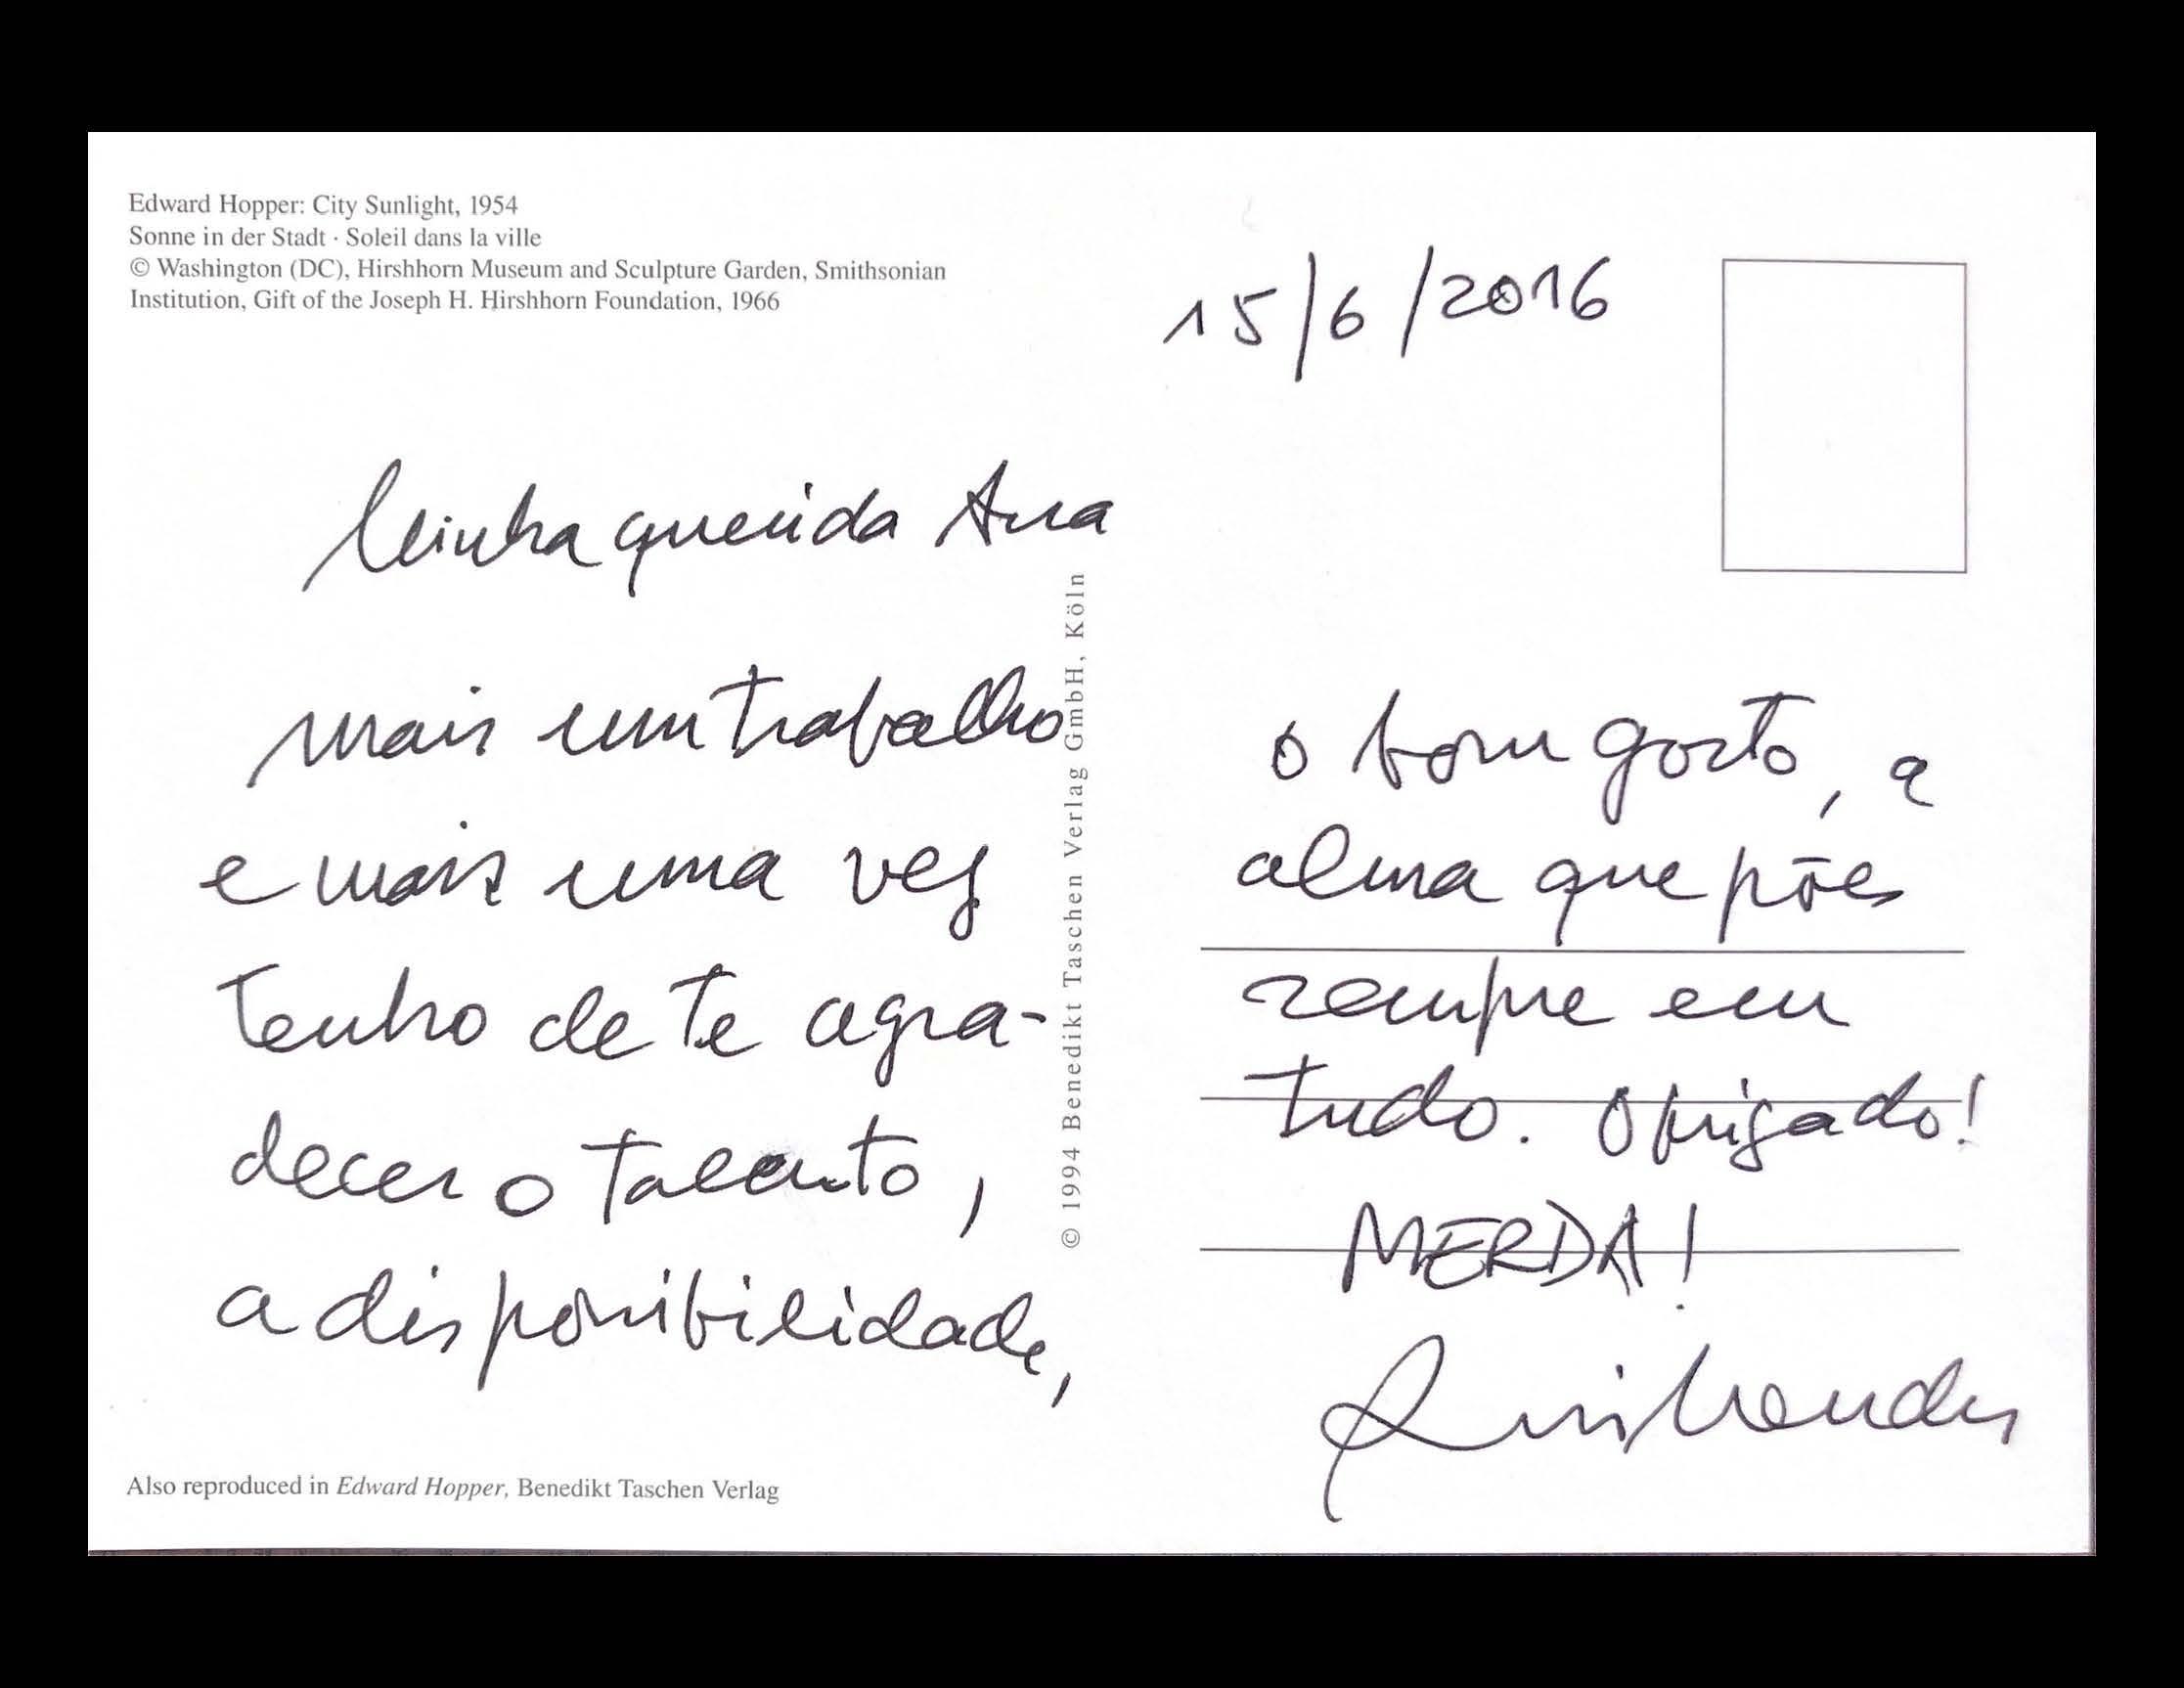 Ana Paula Rocha - Testemunhos - 018